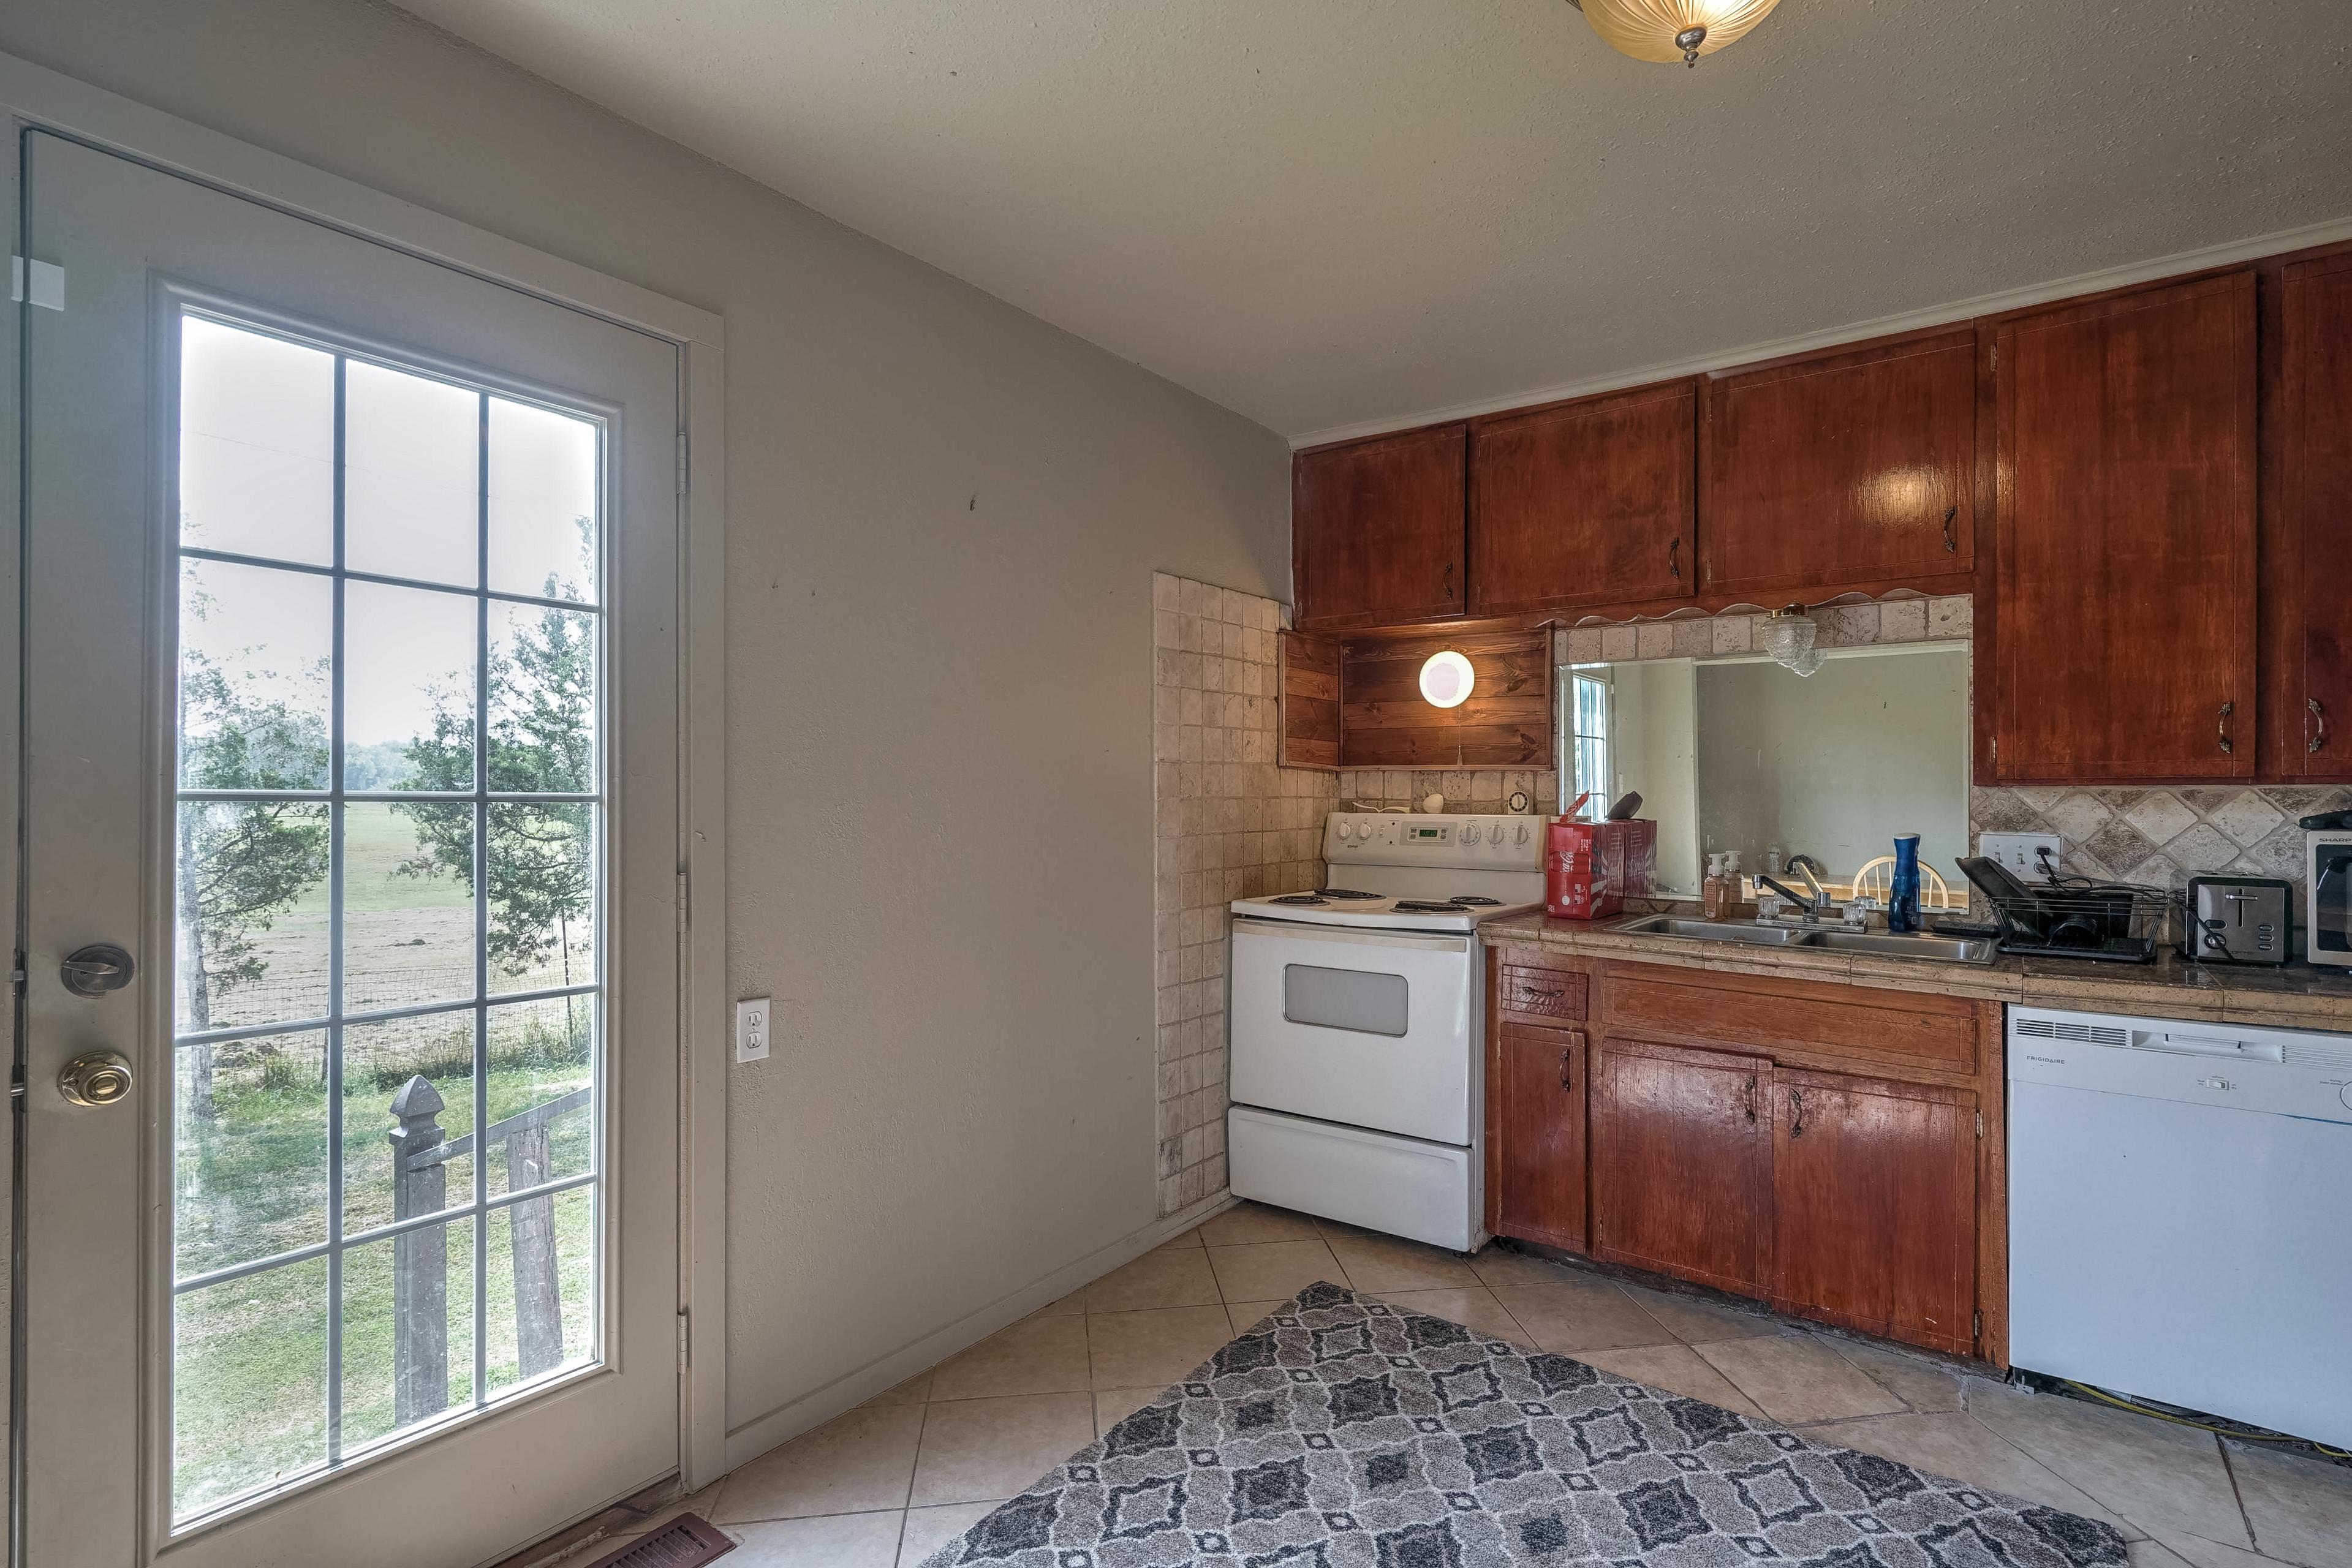 11 S Bell Street Property Photo 11